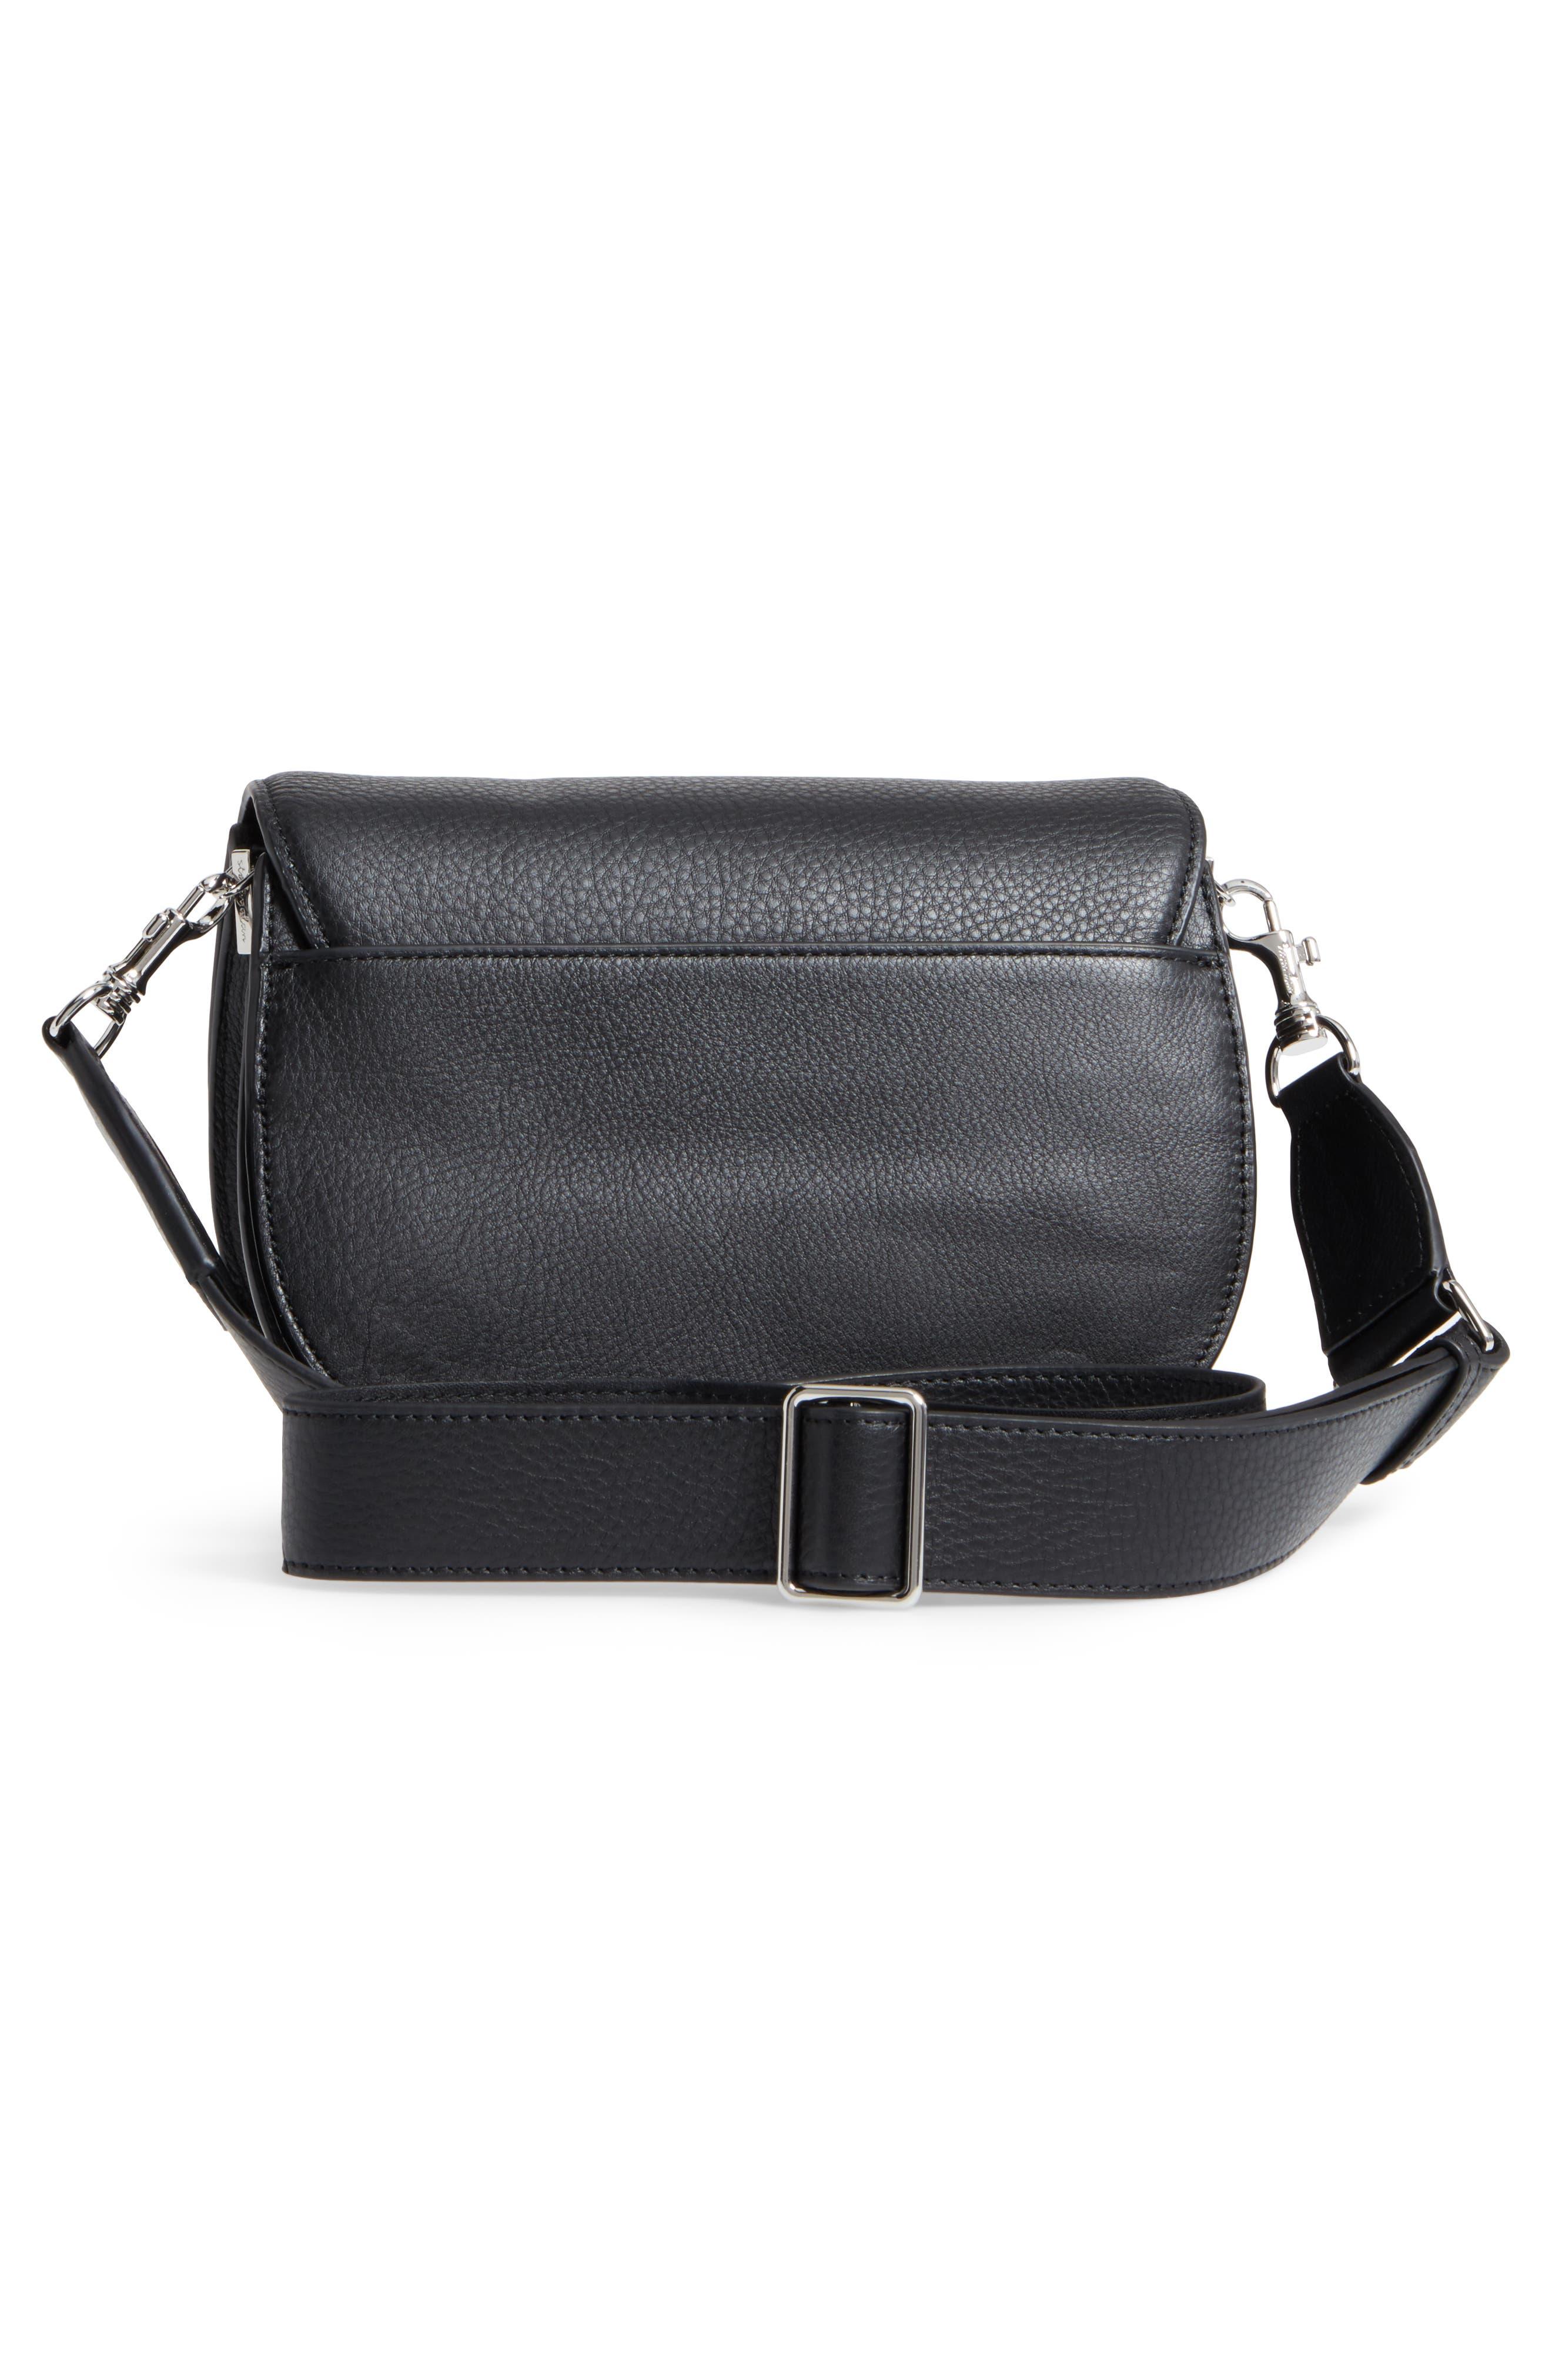 Landon Leather Crossbody Saddle Bag,                             Alternate thumbnail 9, color,